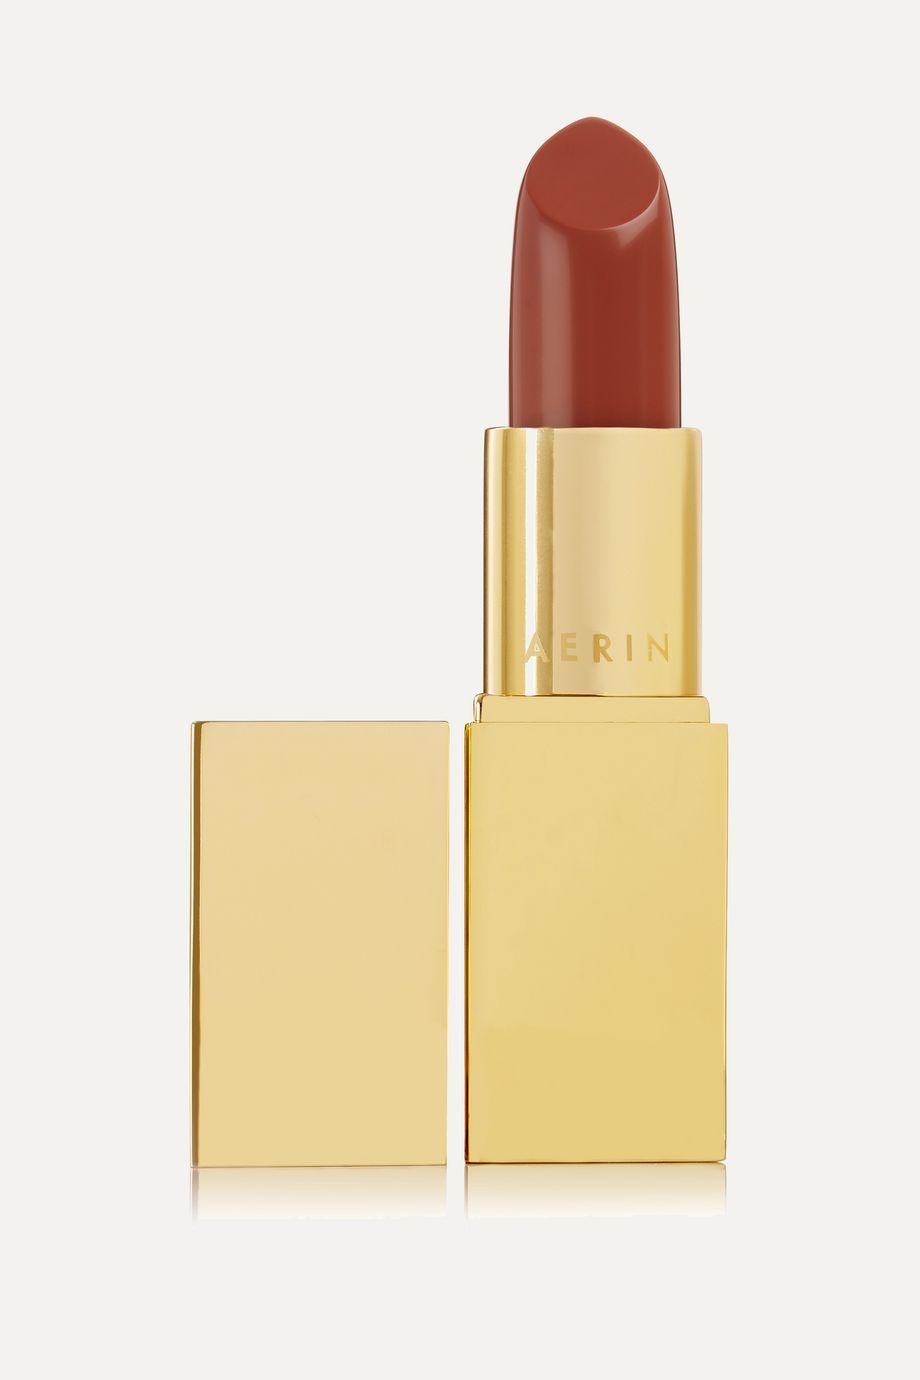 AERIN Beauty Rose Balm Lipstick - Perfect Nude